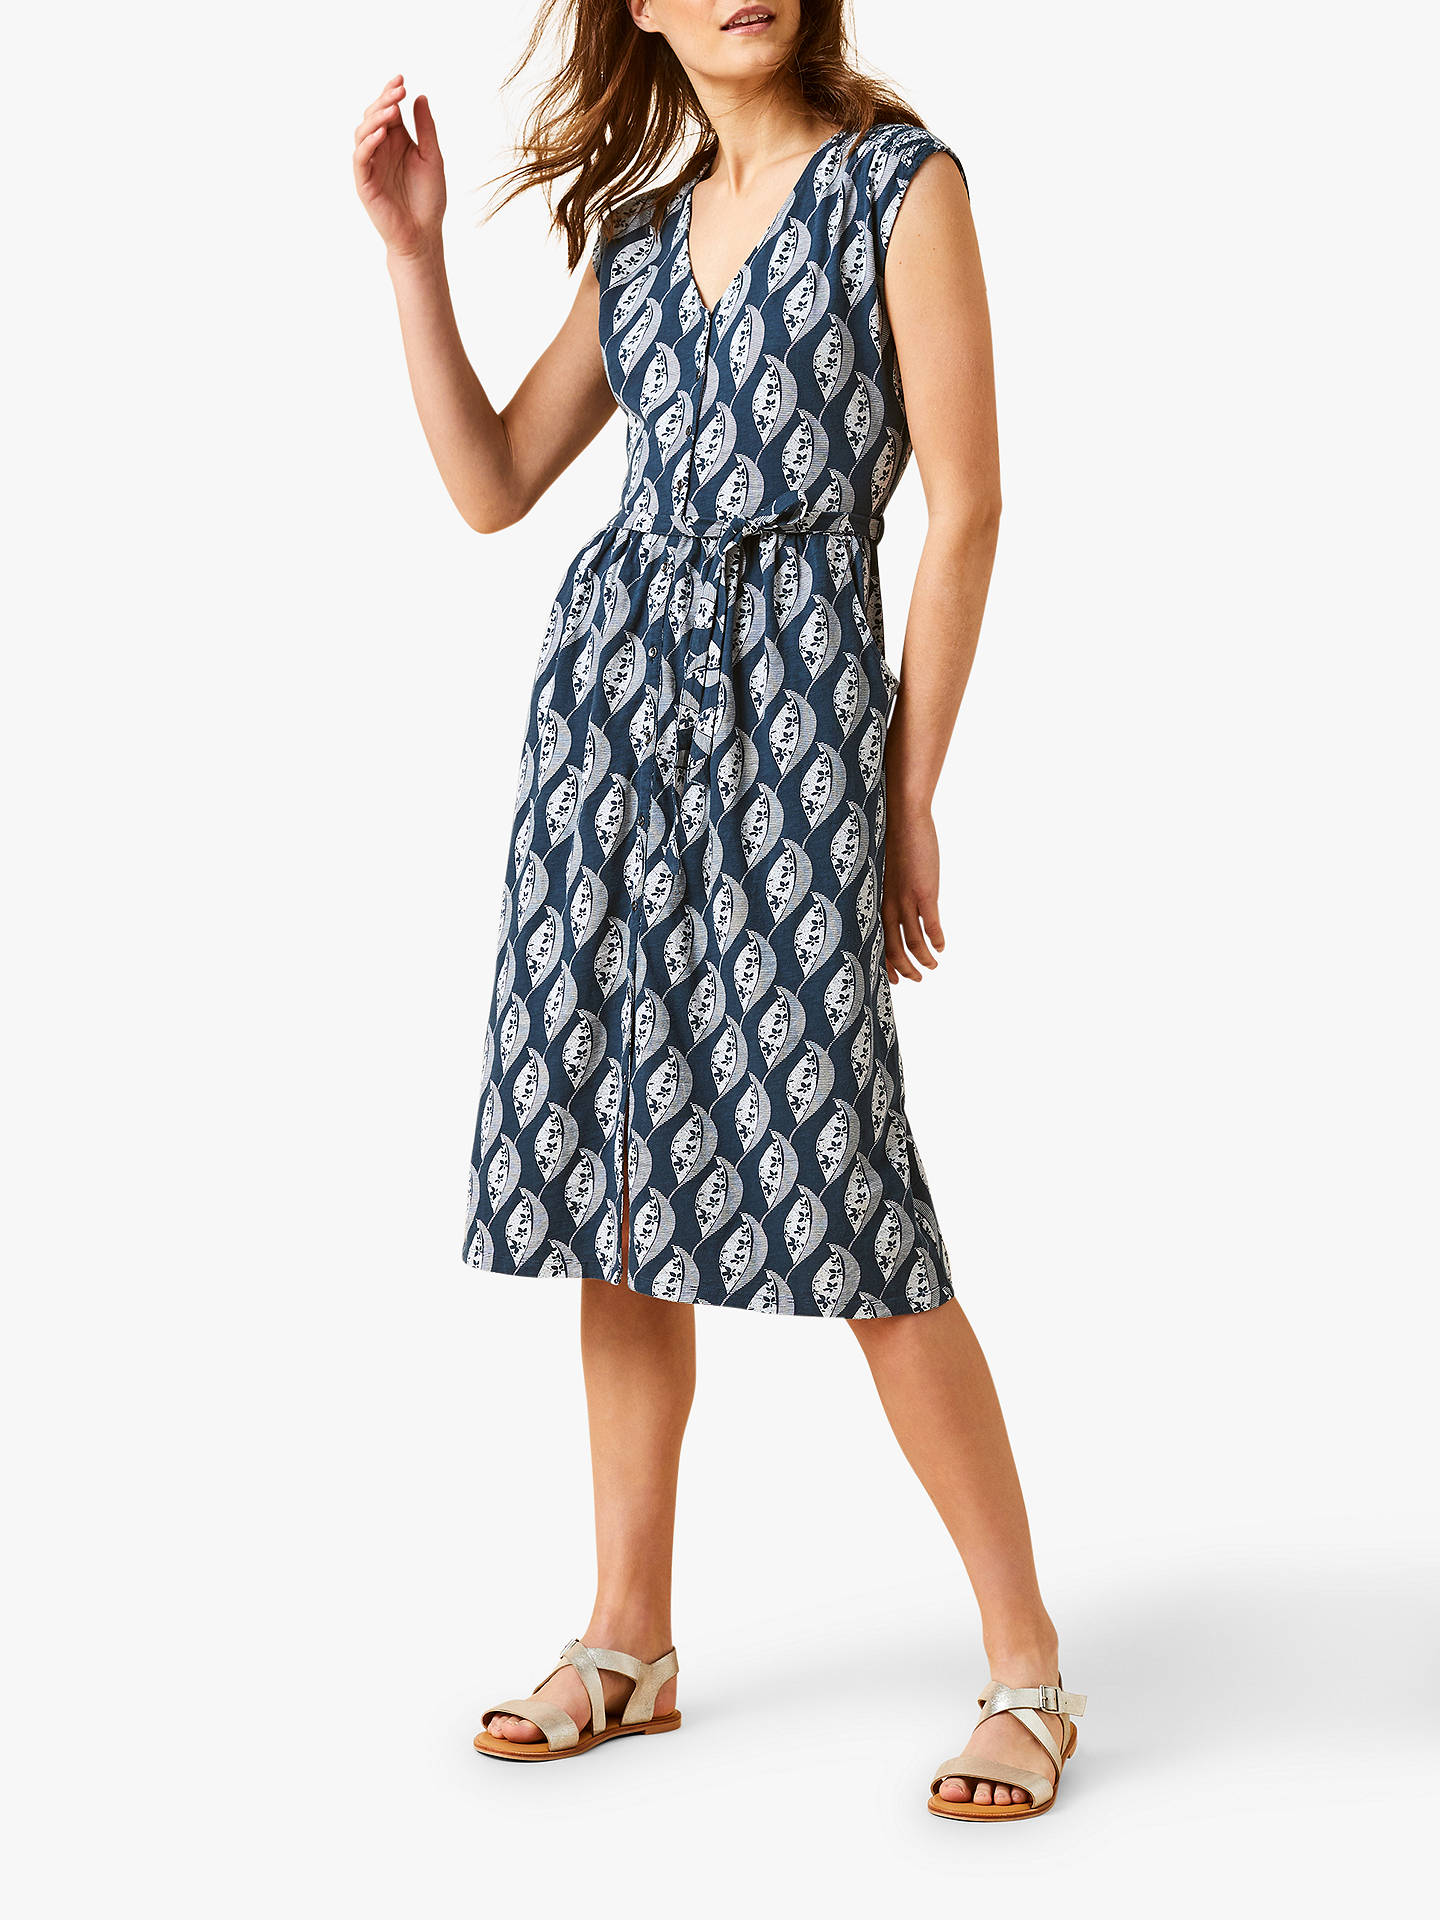 938aa7670af1 Buy White Stuff Destination Fairtrade Dress